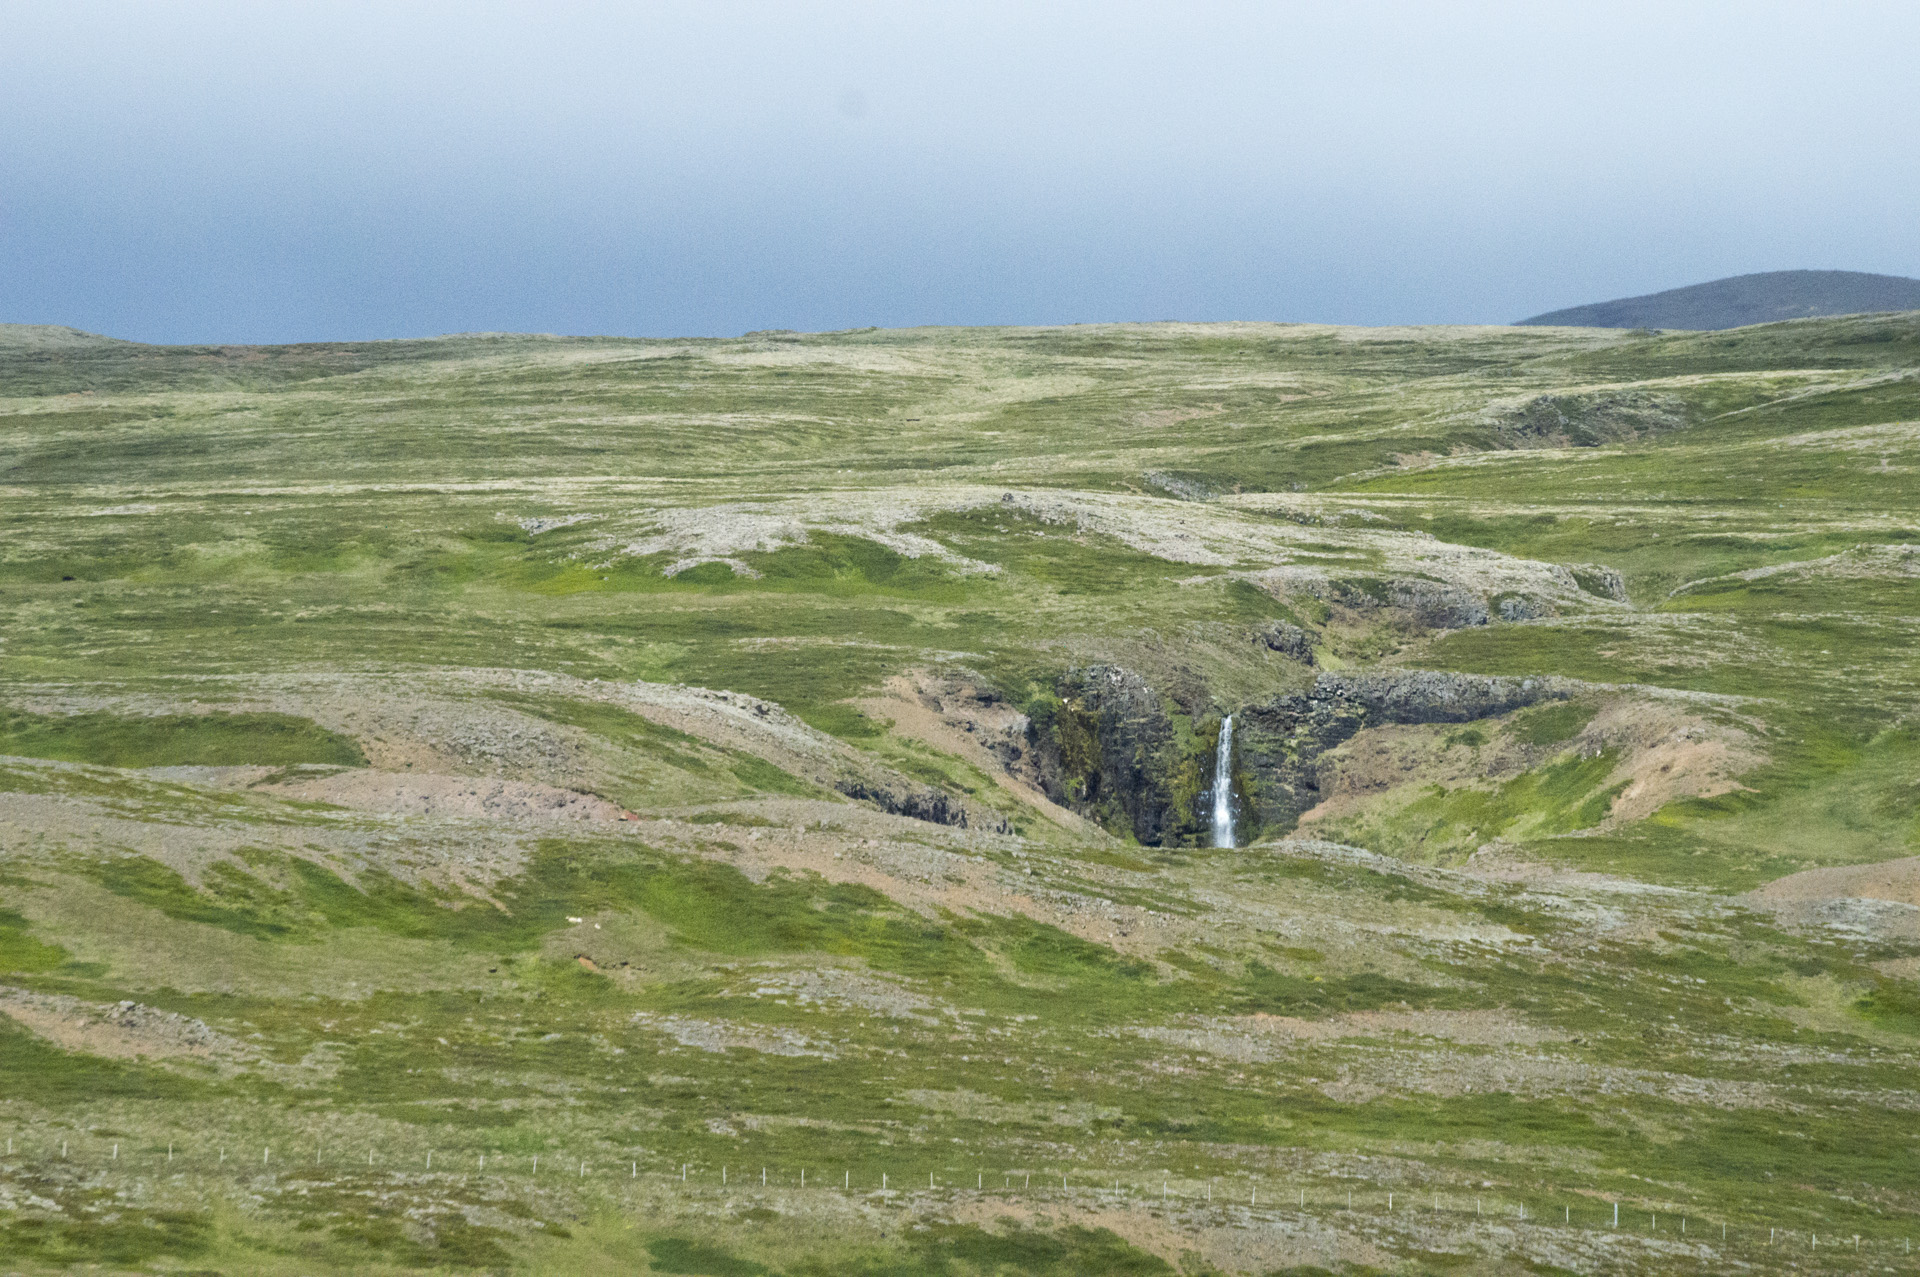 Small waterfall west of the Gerðuberg Cliffs, Vesturland region, Iceland.